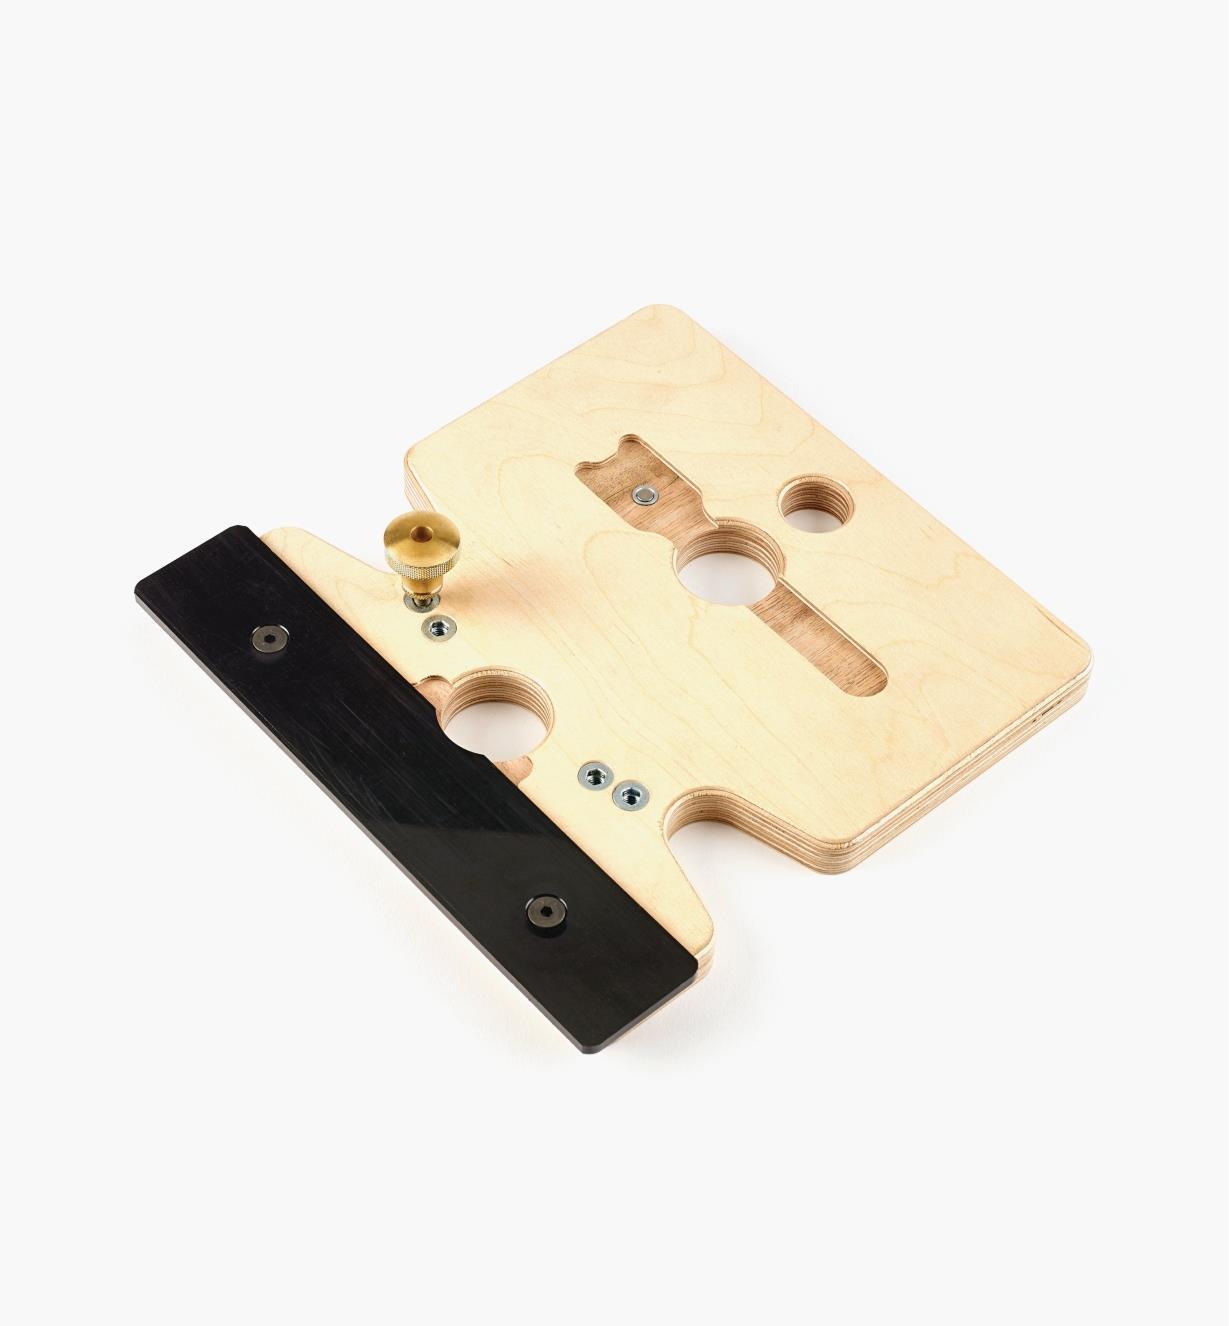 05P4180 - Veritas Hand Jointer